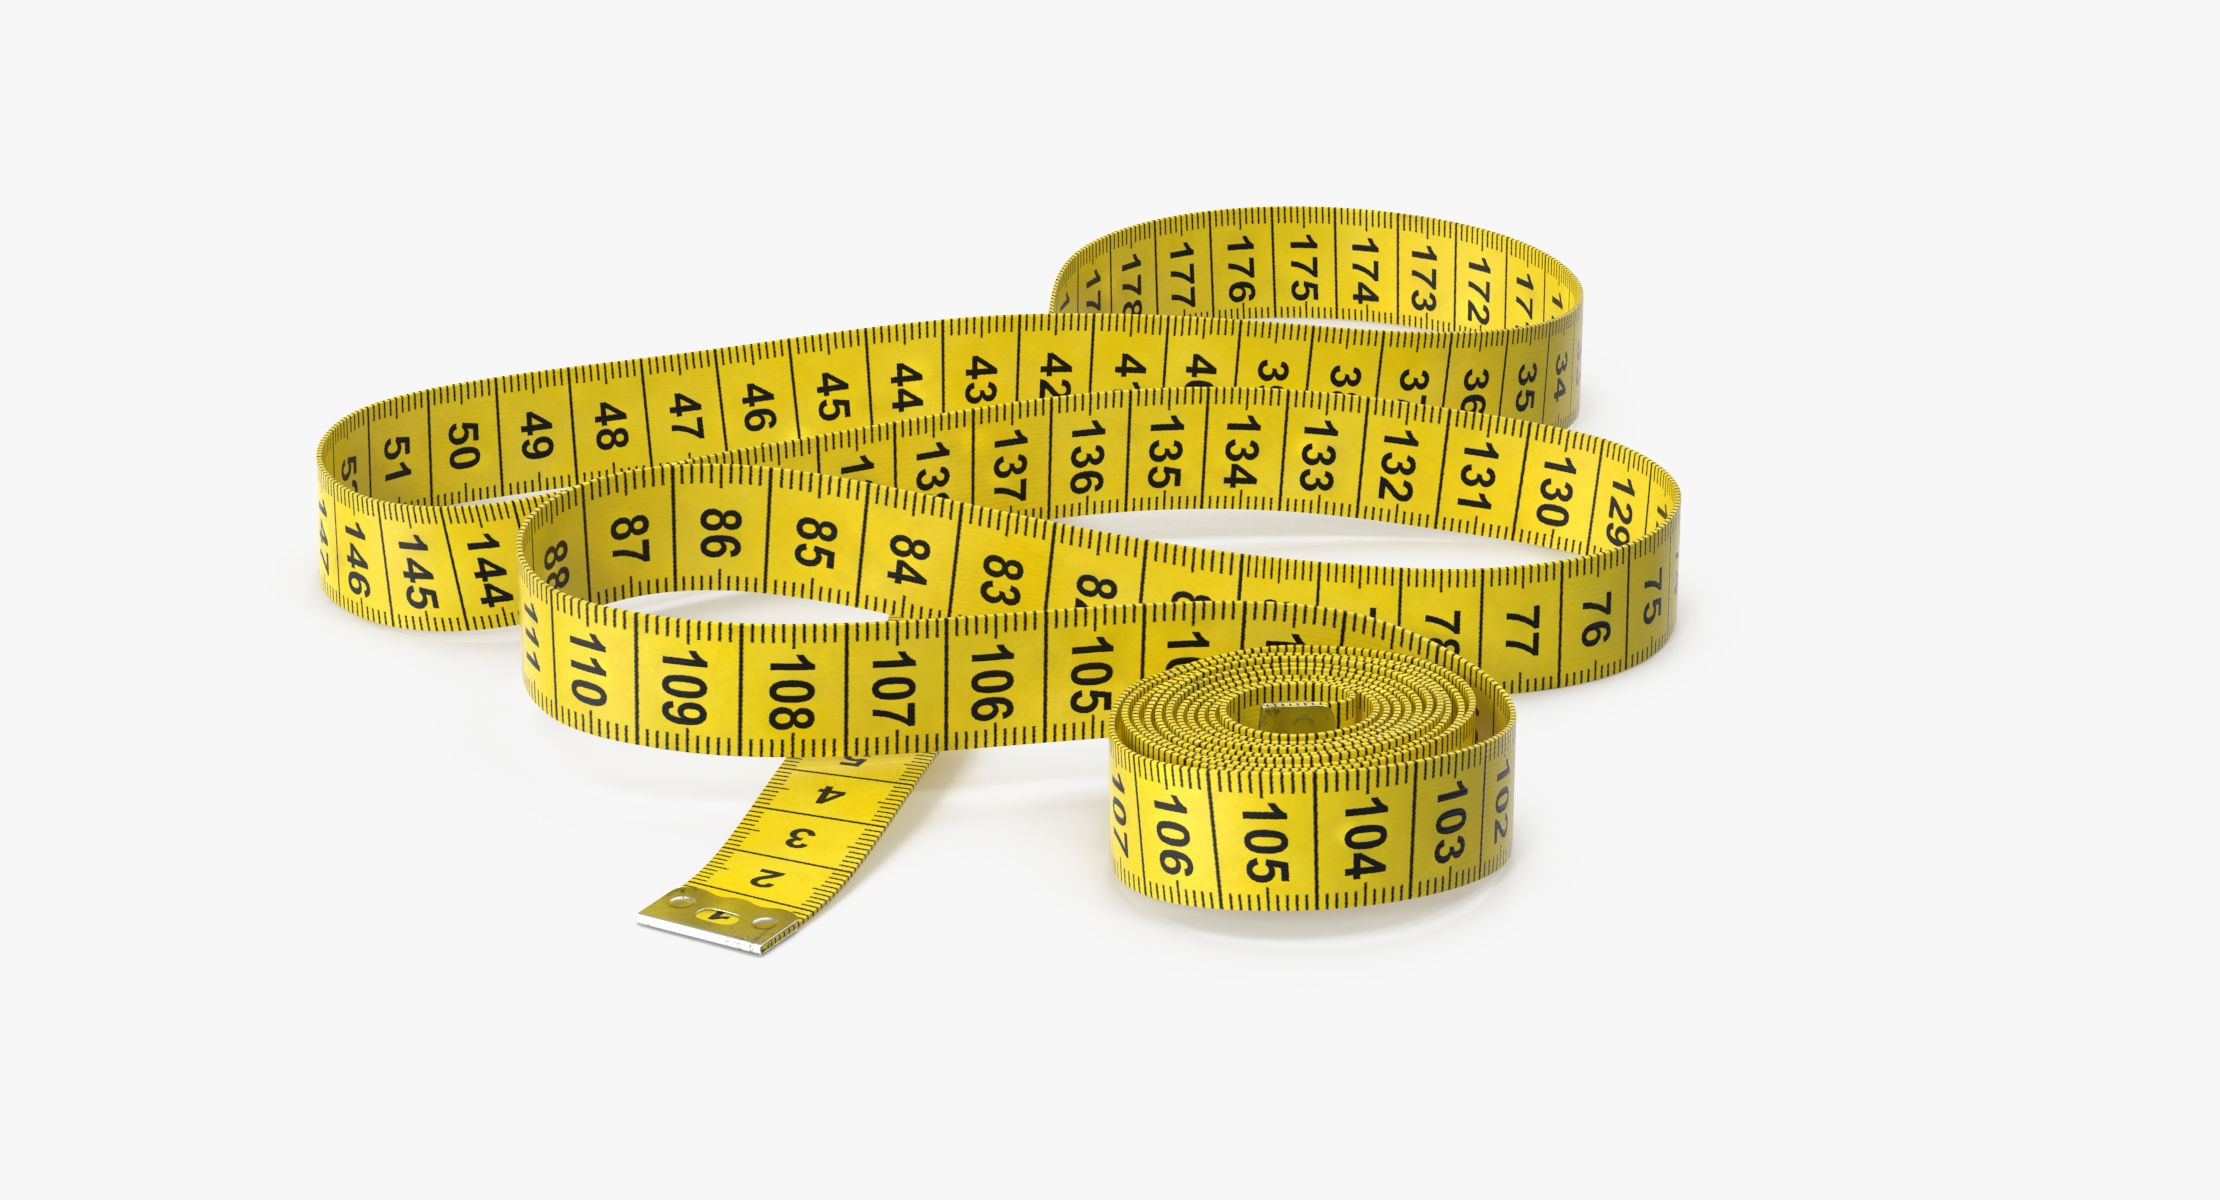 Tape Measurer 04 - reel 1